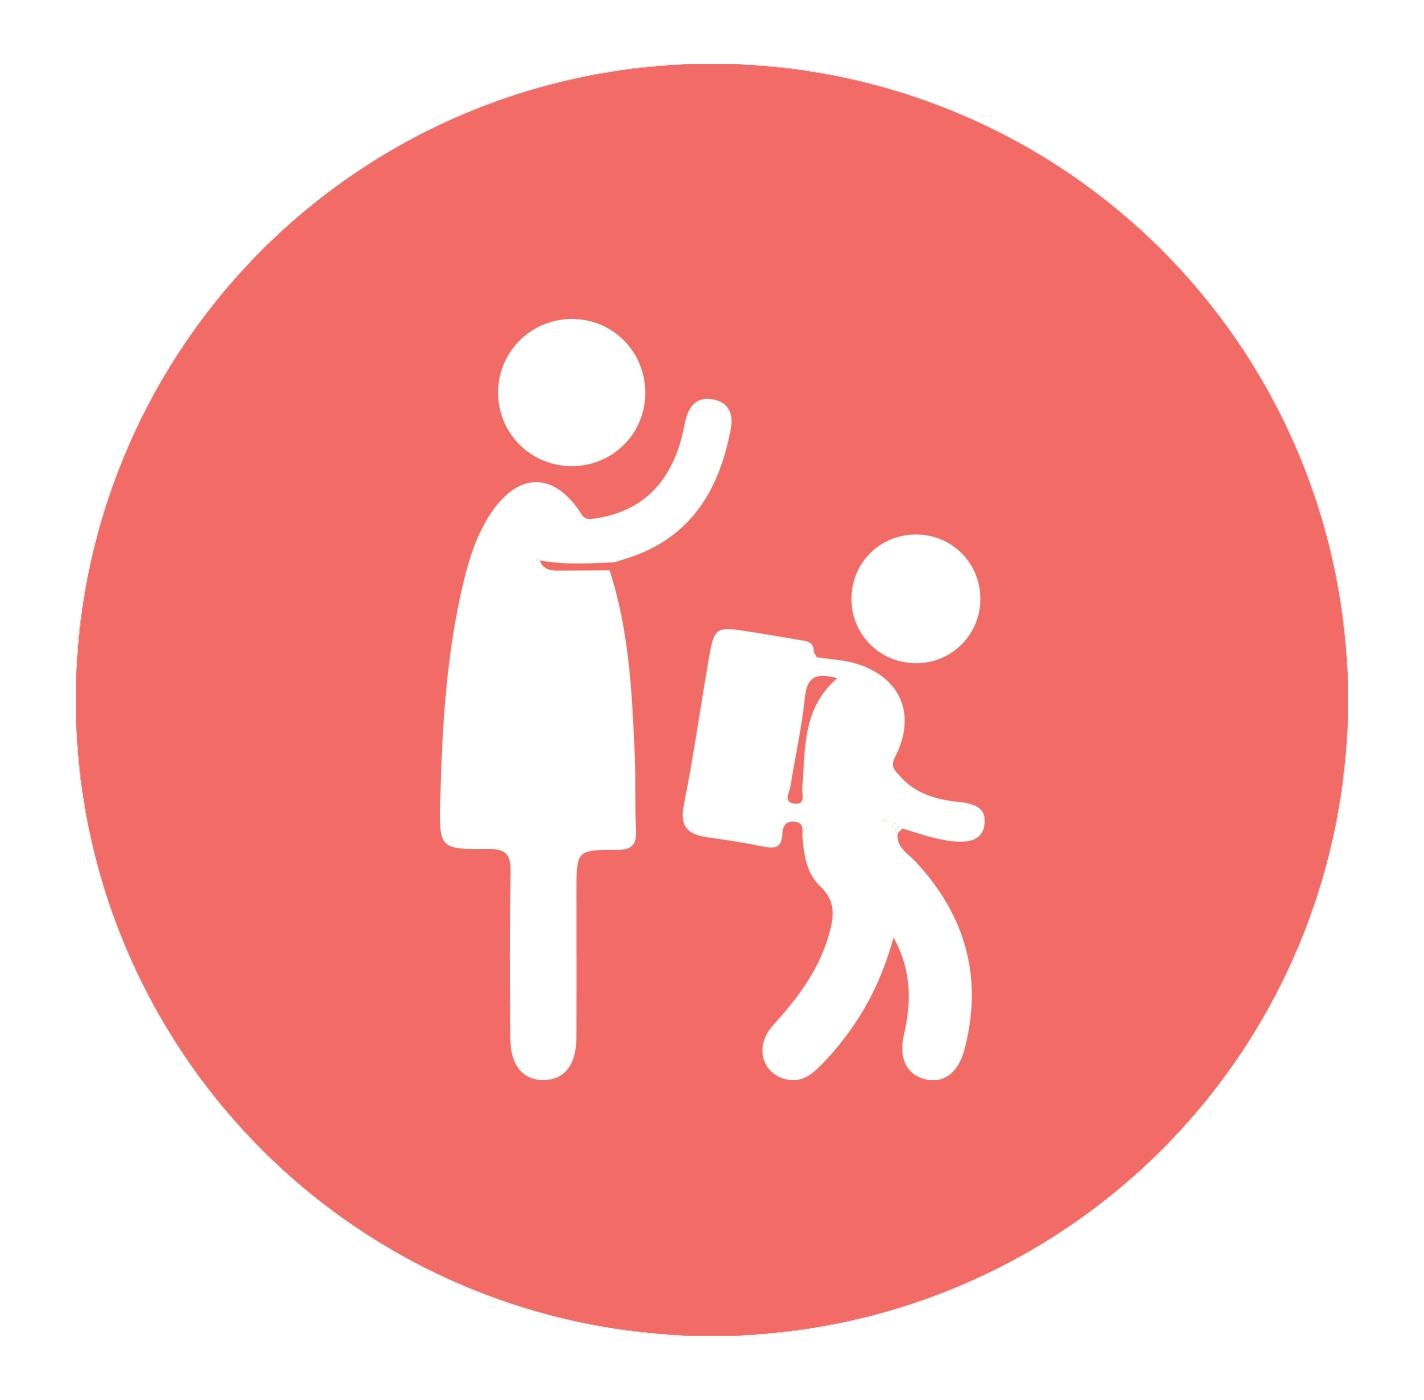 parent and child icon - child maltreatment defined